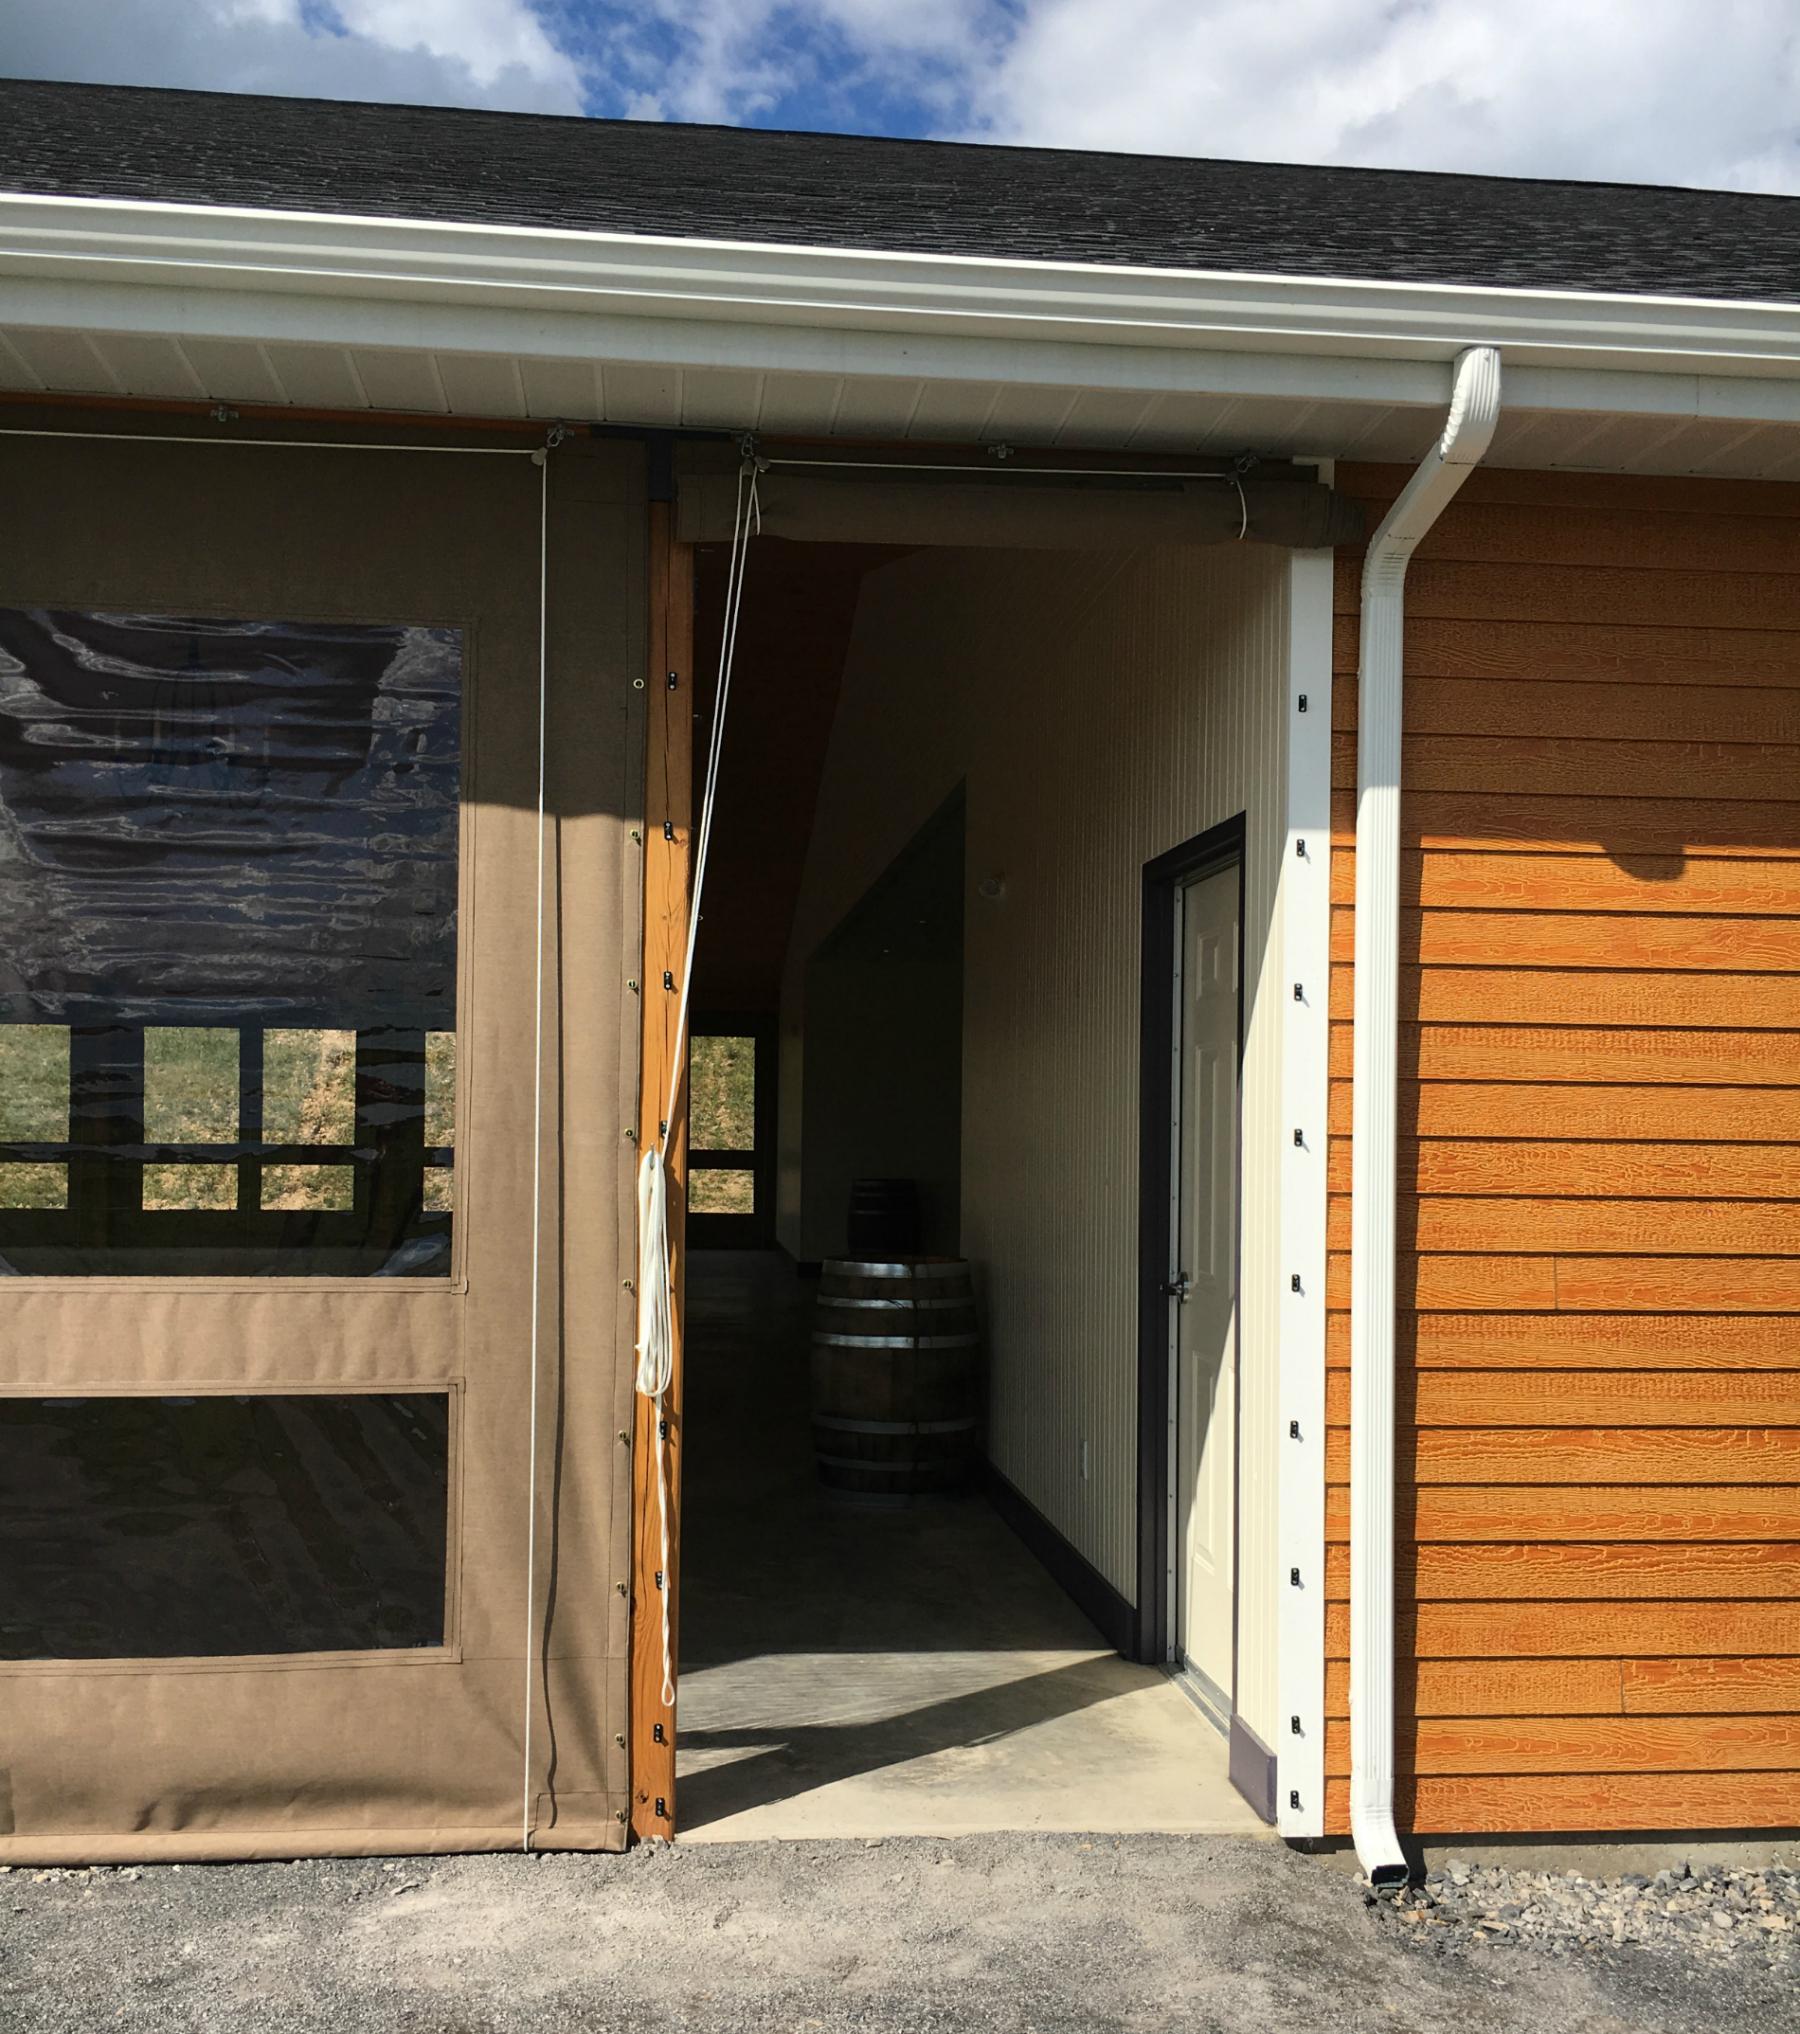 View · Fero ... & Vineyard wedding venue enclosure | Kreider\u0027s Canvas Service Inc.